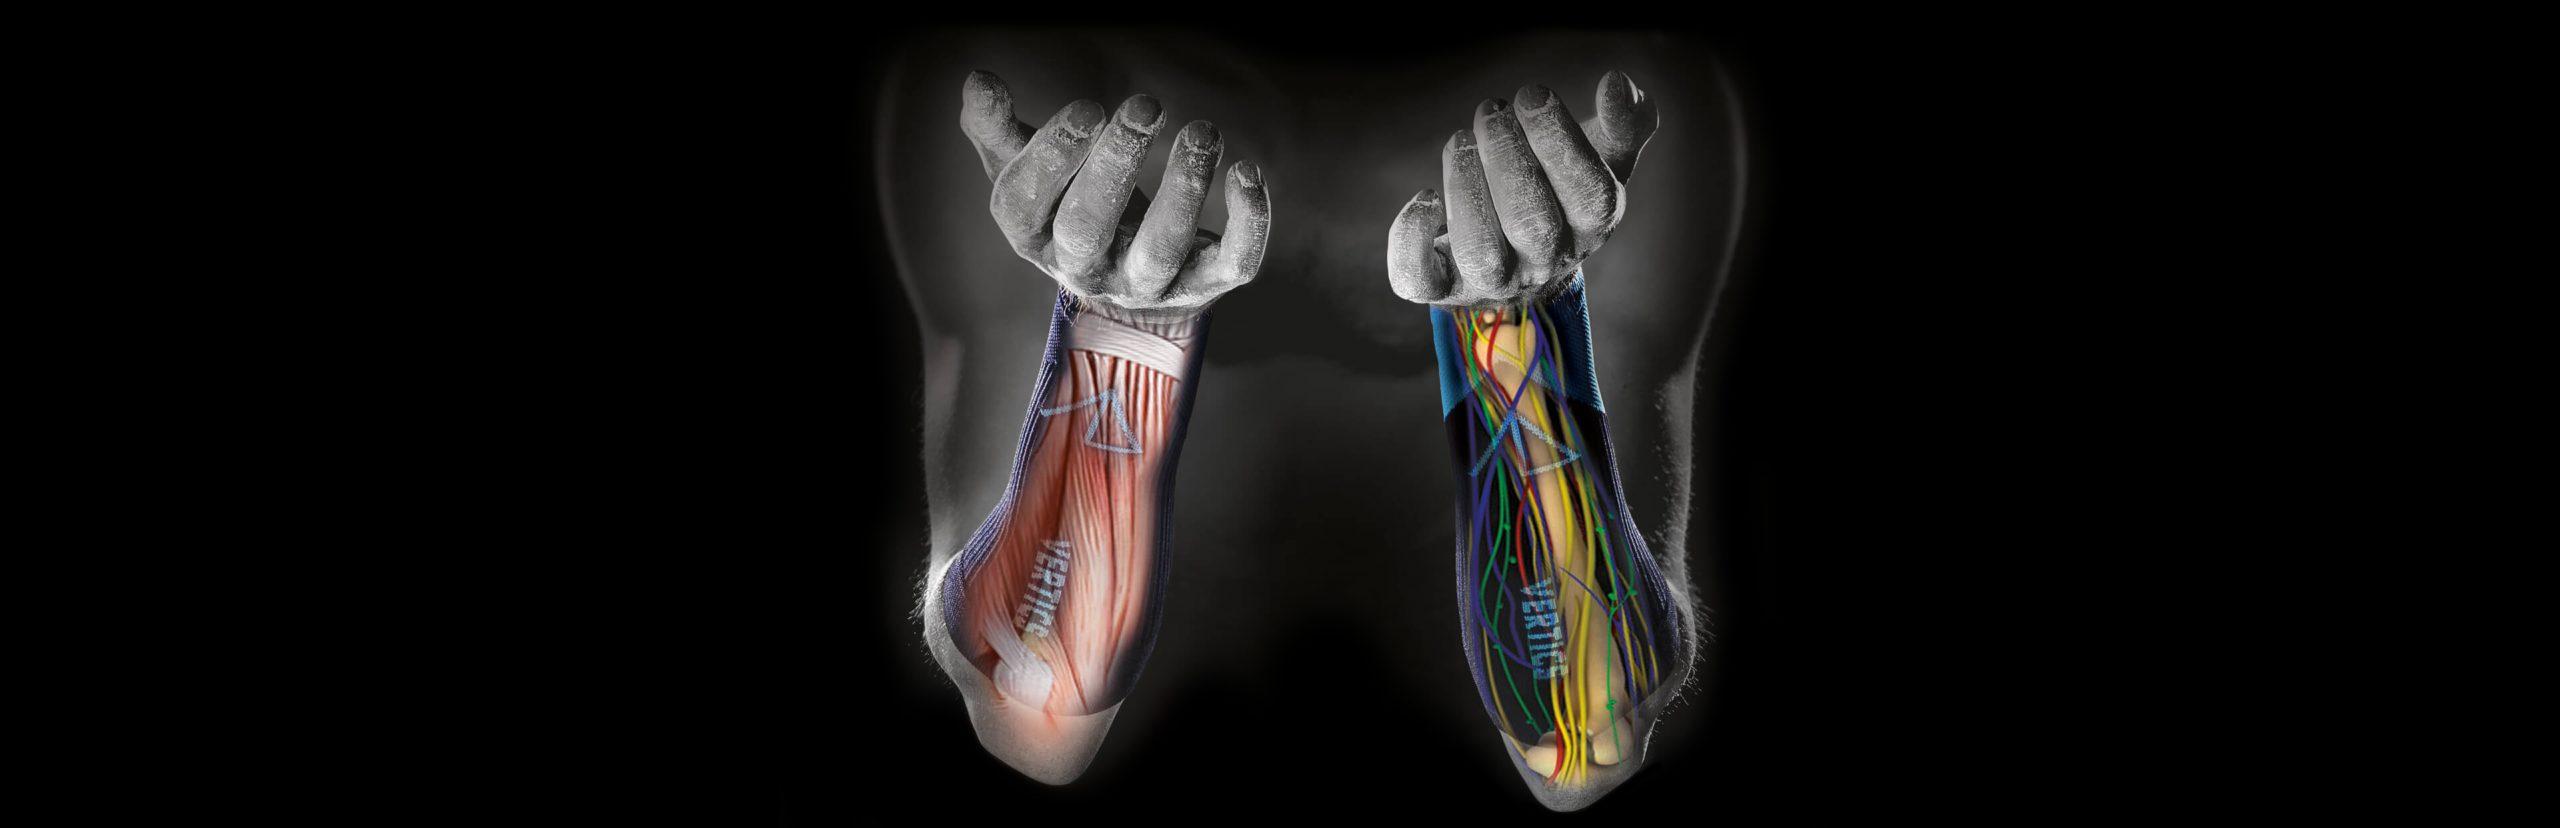 Anatomie VERTICS.Sleeves